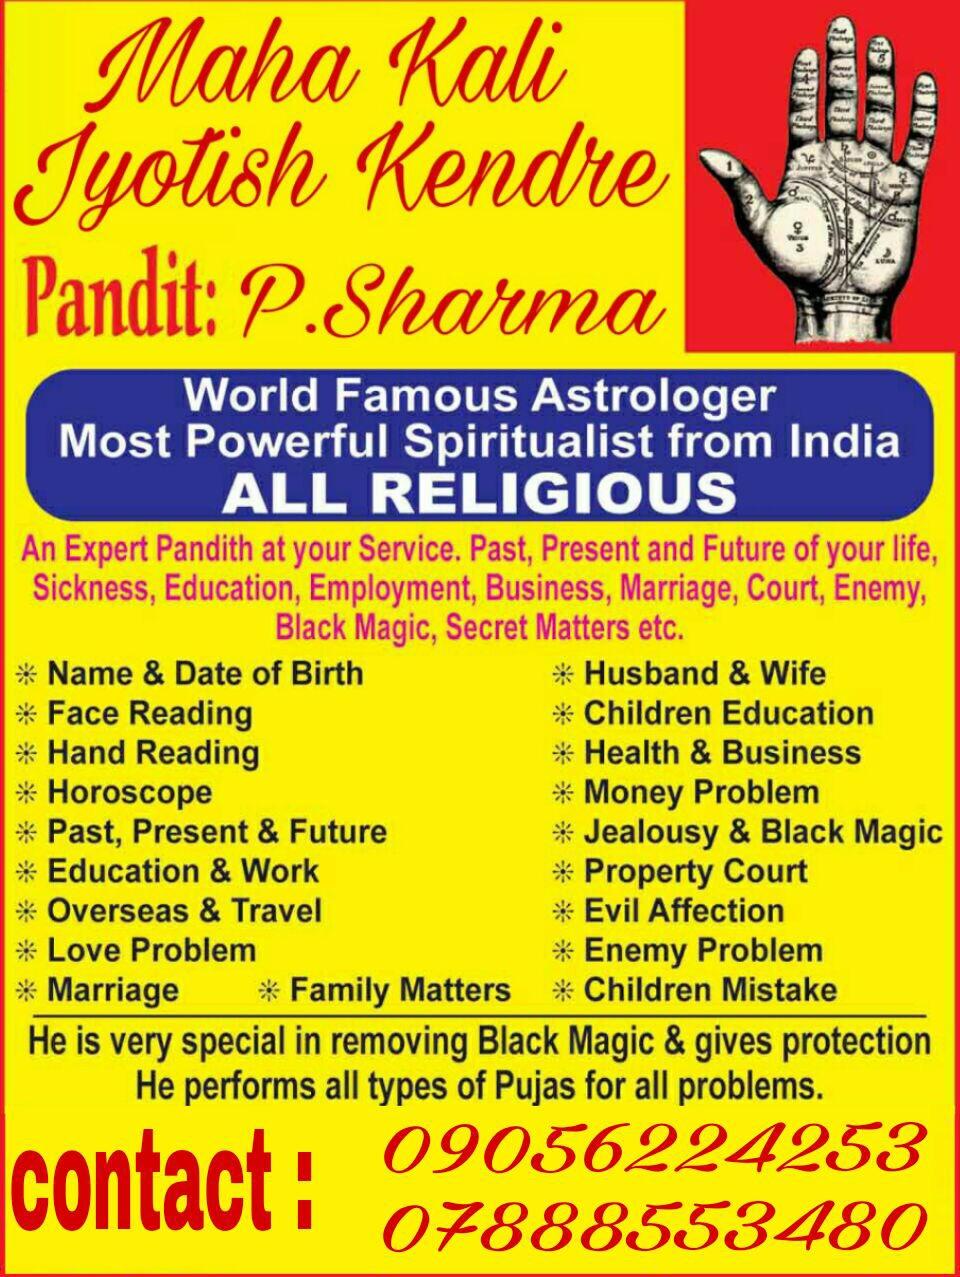 Pandit P. Sharma